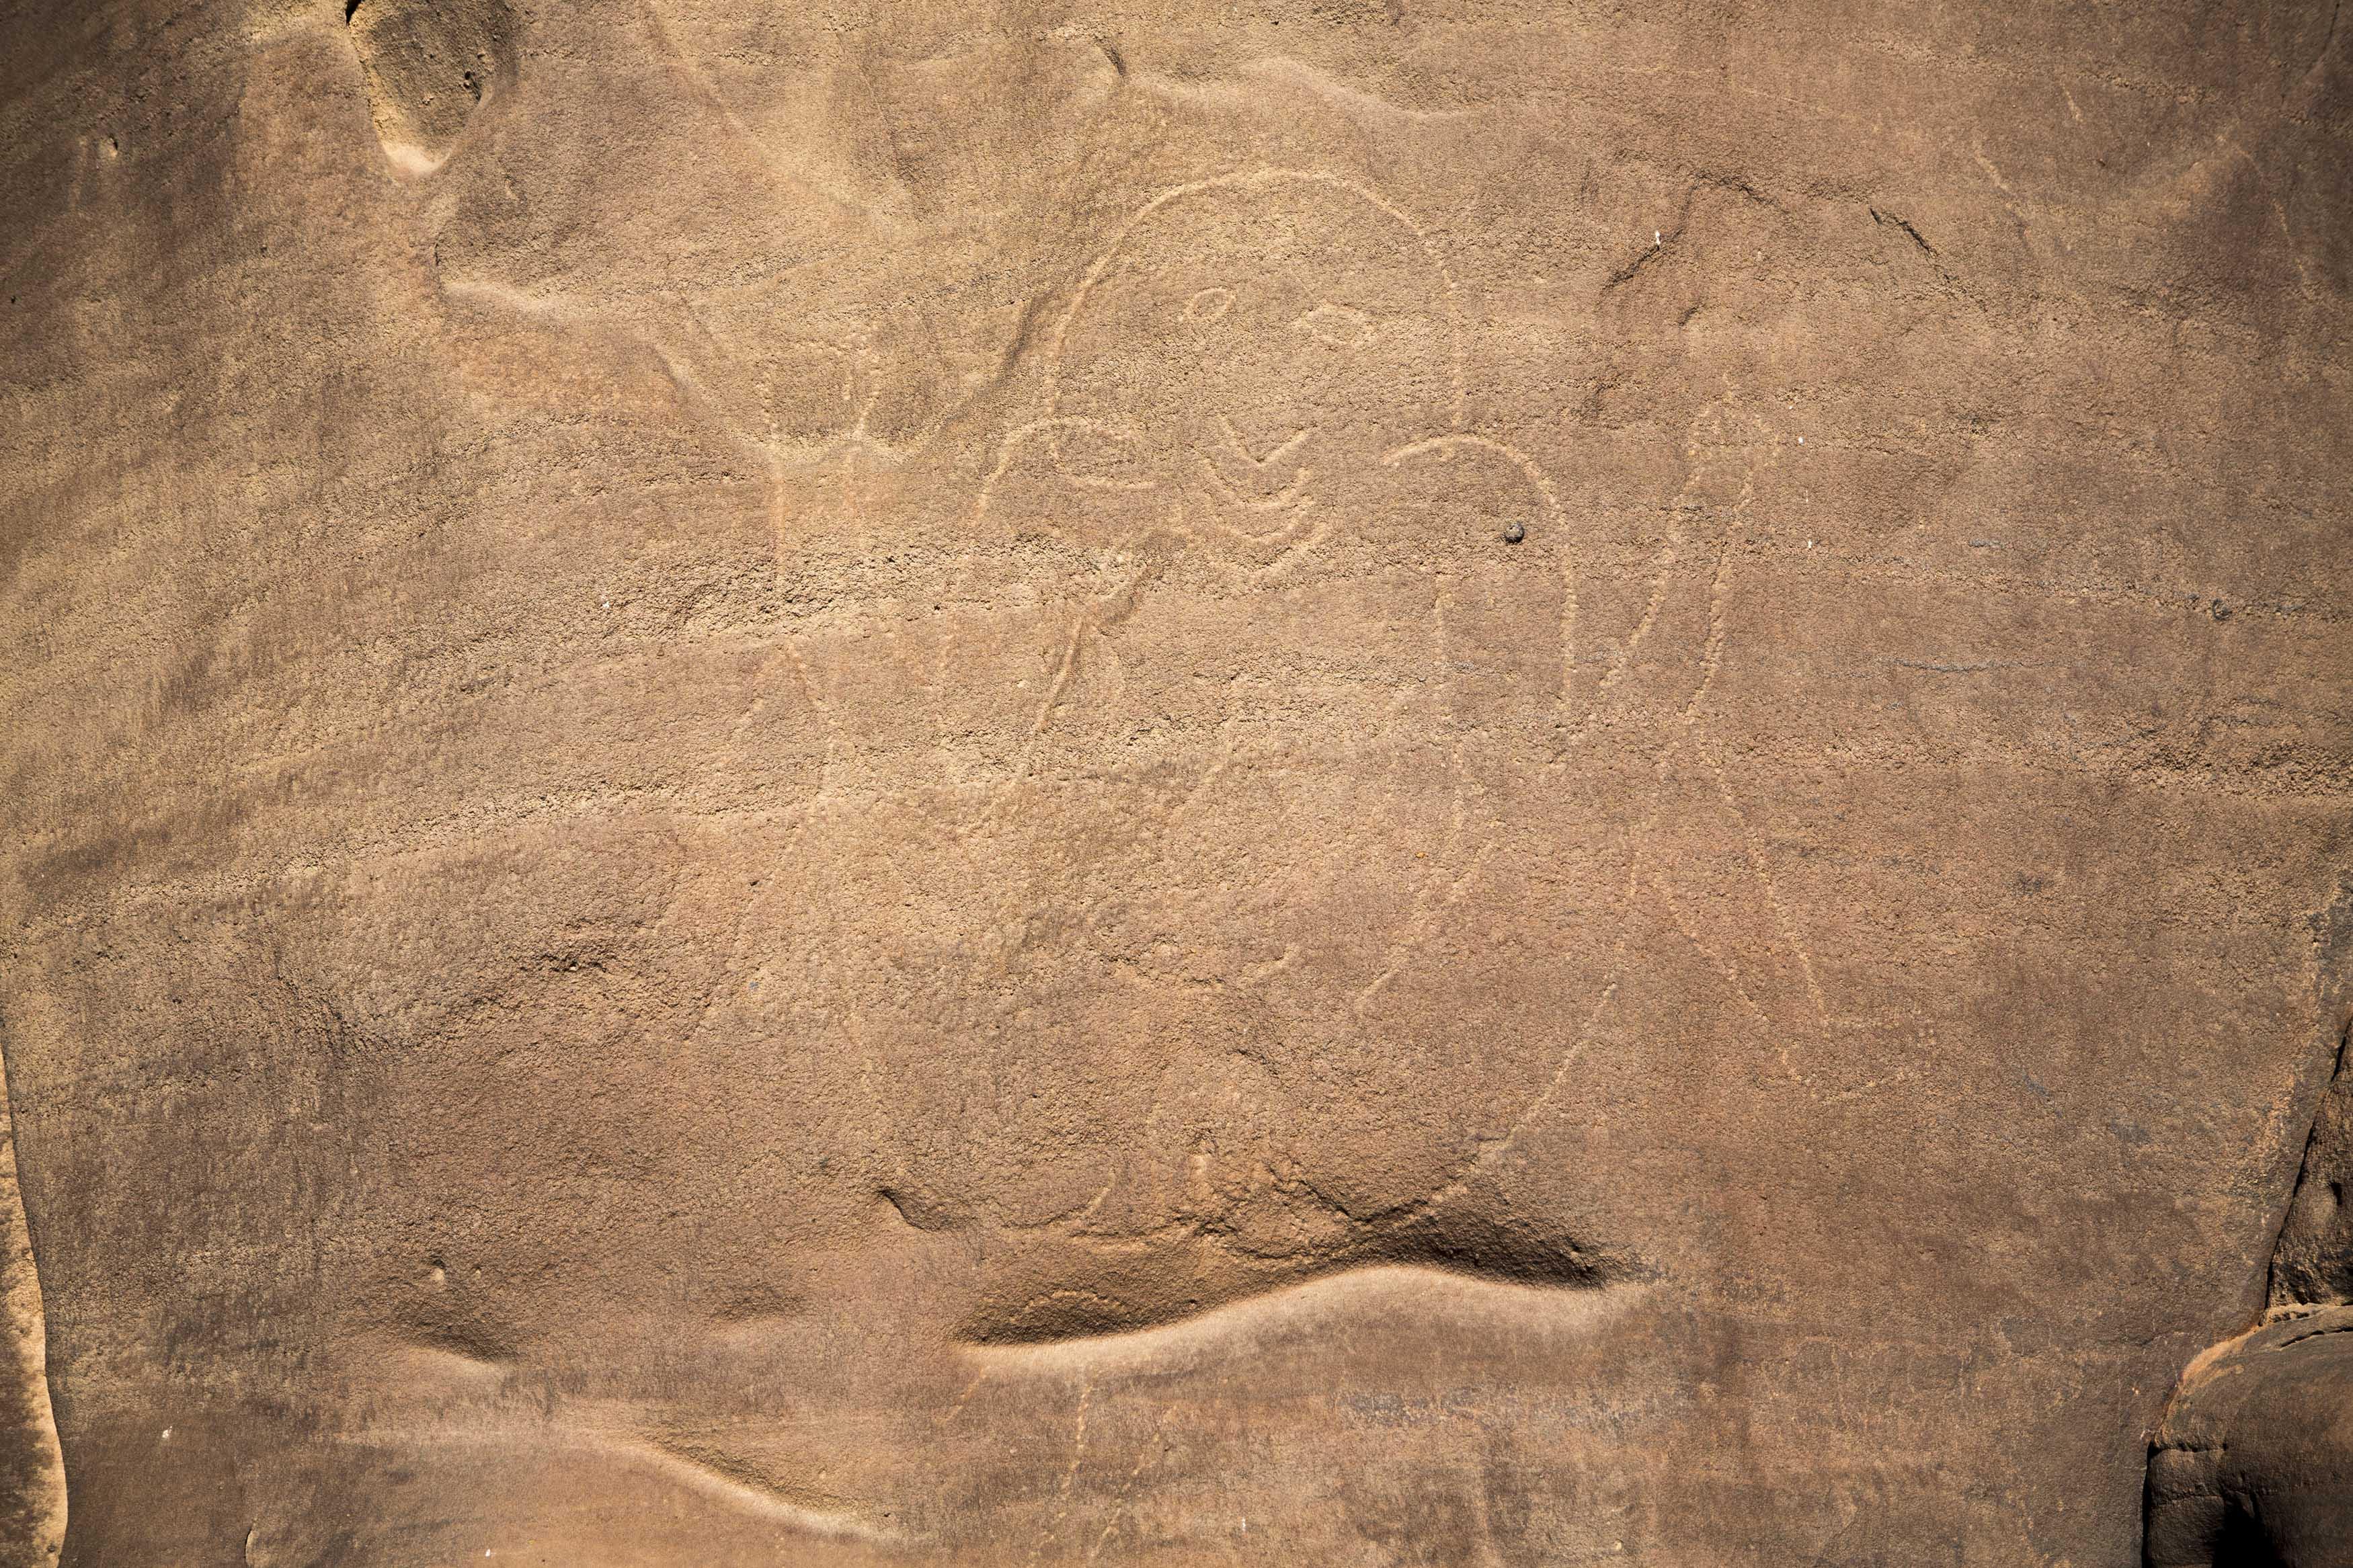 Cave engraving depicting a woman on a wall in the Tadrart.The Tadrart (200 km southeast of Djanet) is located in the south of the Tassili N'Ajjer National Park and is part of one of the most beautiful desert in the world but above all the central Sahara.From huge canyons to cliffs carved with rocky peaks of various shapes mix with dunes of colored sand with yellow and red reflections. The Tadrart, Algeria-February 6, 2017.Gravure rupestre représentant une femme sur une paroi dans la Tadrart. La Tadrart (200 km au sud-est de Djanet) se situe dans le sud du Parc National du Tassili N'Ajjer et il fait partie d'un des plus beau désert au monde mais avant tout du Sahara central. D'immenses canyons aux falaises sculptées avec de pitons rocheux aux formes les plus diverses  se mélangent avec des dunes de sable coloré aux reflets jaune et rouge. La Tadrart,, Algérie-6 février 2017.